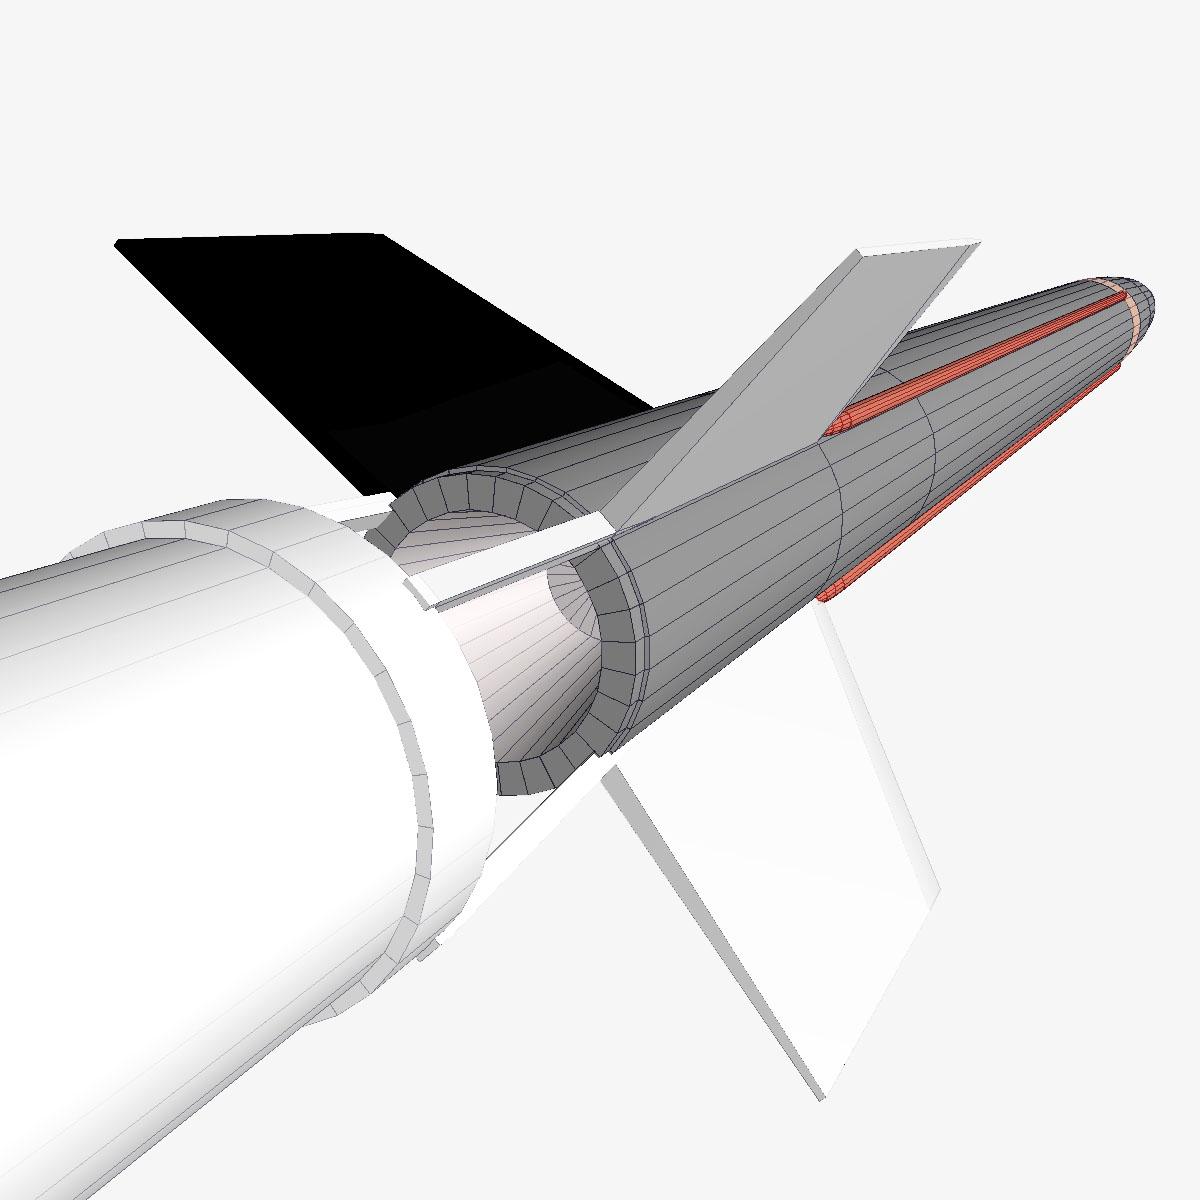 aerobee 170 rocket 3d model 3ds dxf fbx blend cob dae x  obj 166046